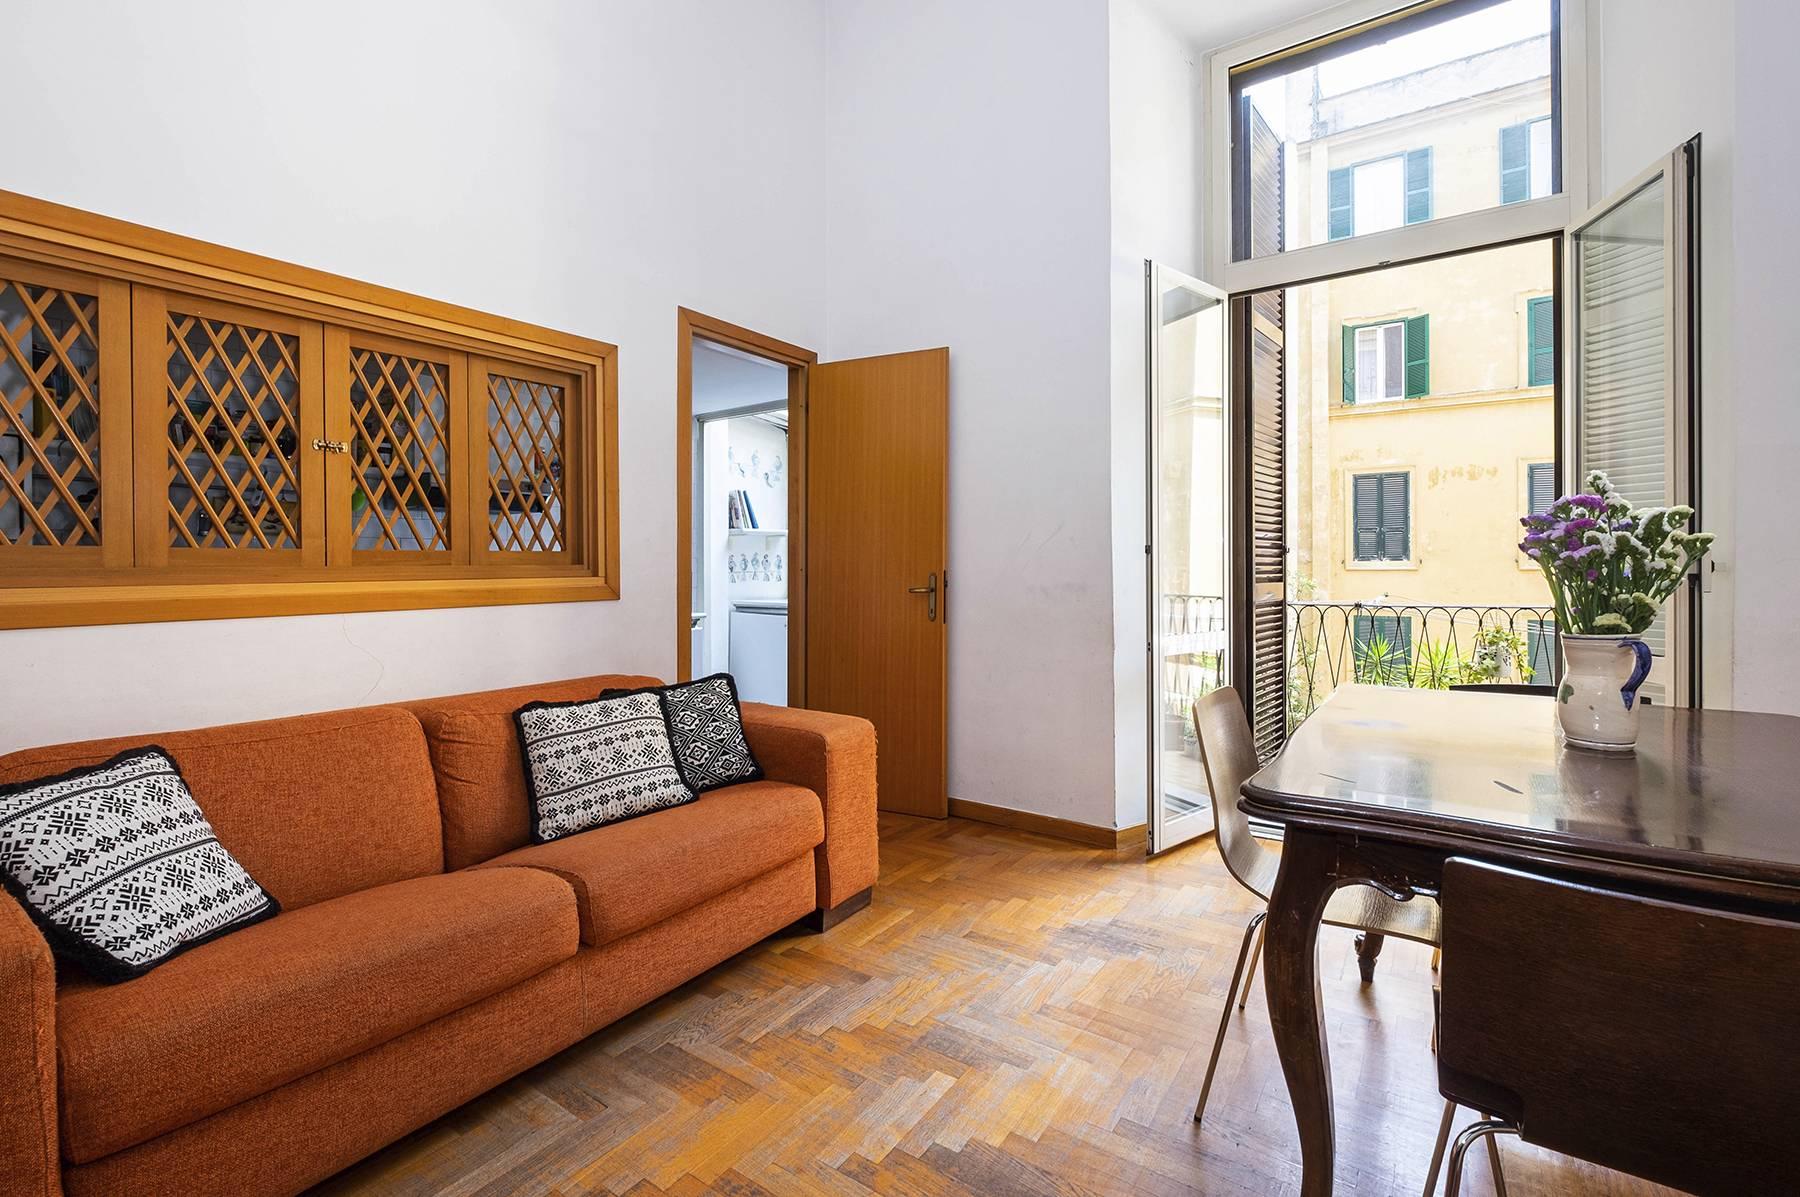 Appartamento in Vendita a Roma via nomentana